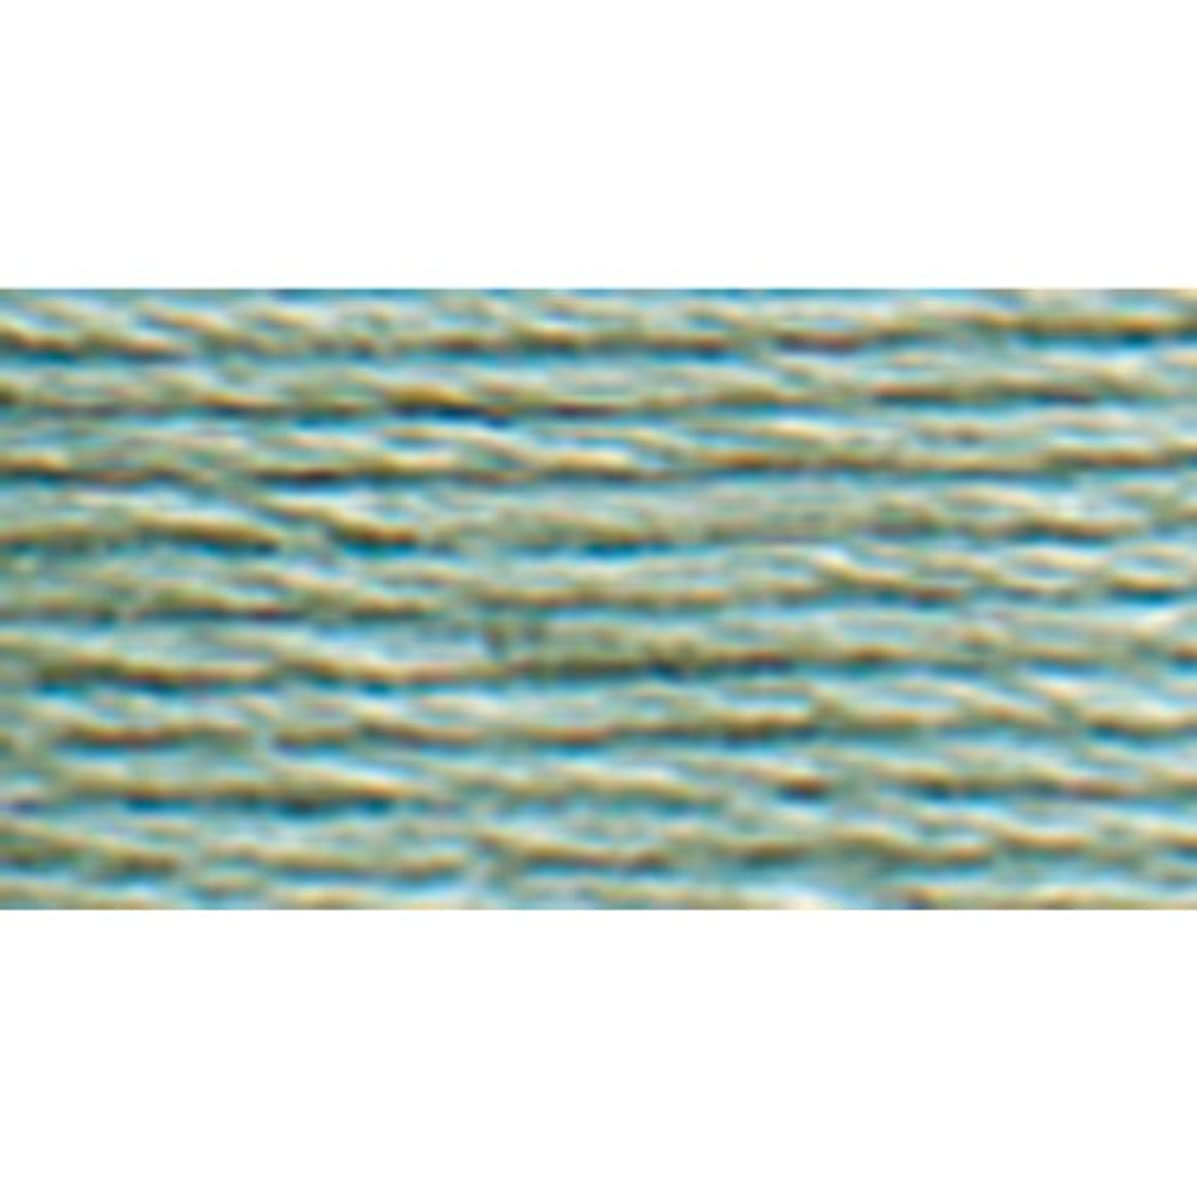 DMC 117-927 6 Strand Embroidery Cotton Floss, Light Grey Green, 8.7-Yard